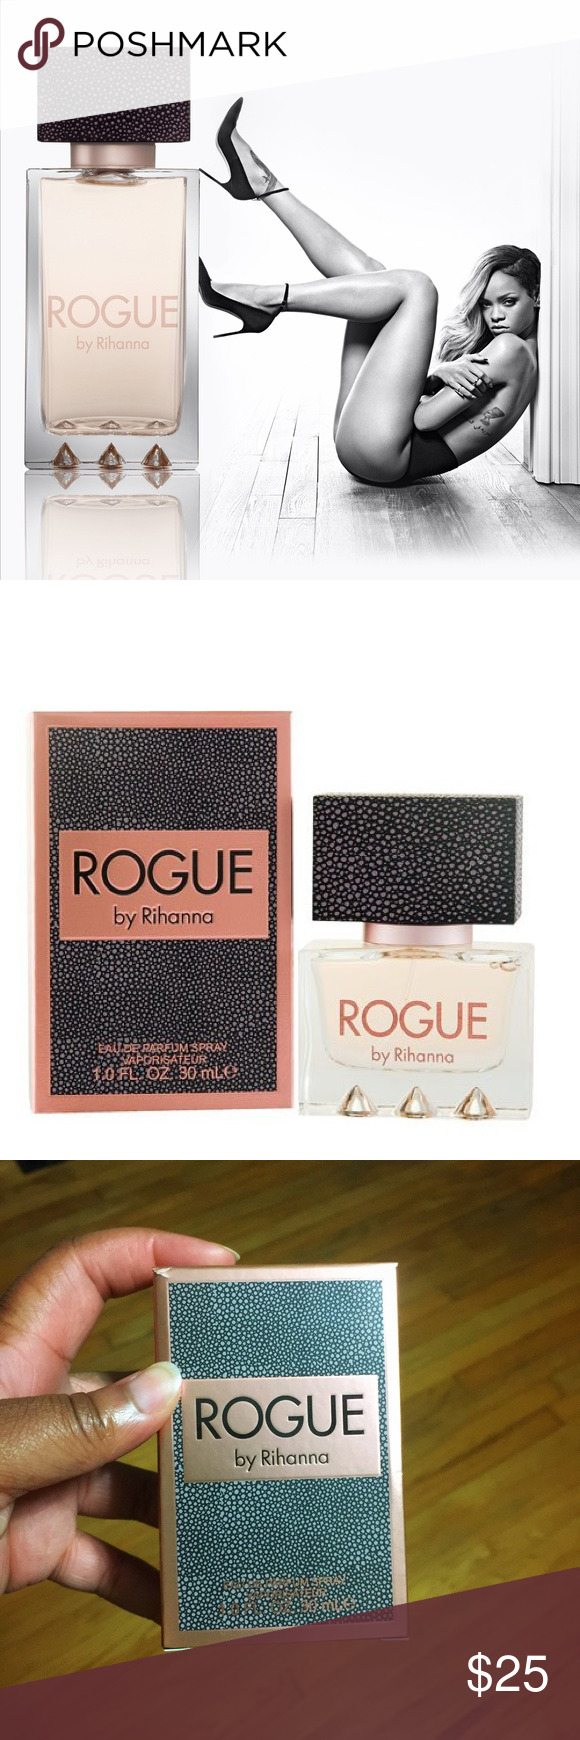 Price Firm Rogue Perfume  Rihanna Perfume, Perfume, Rogues-8760